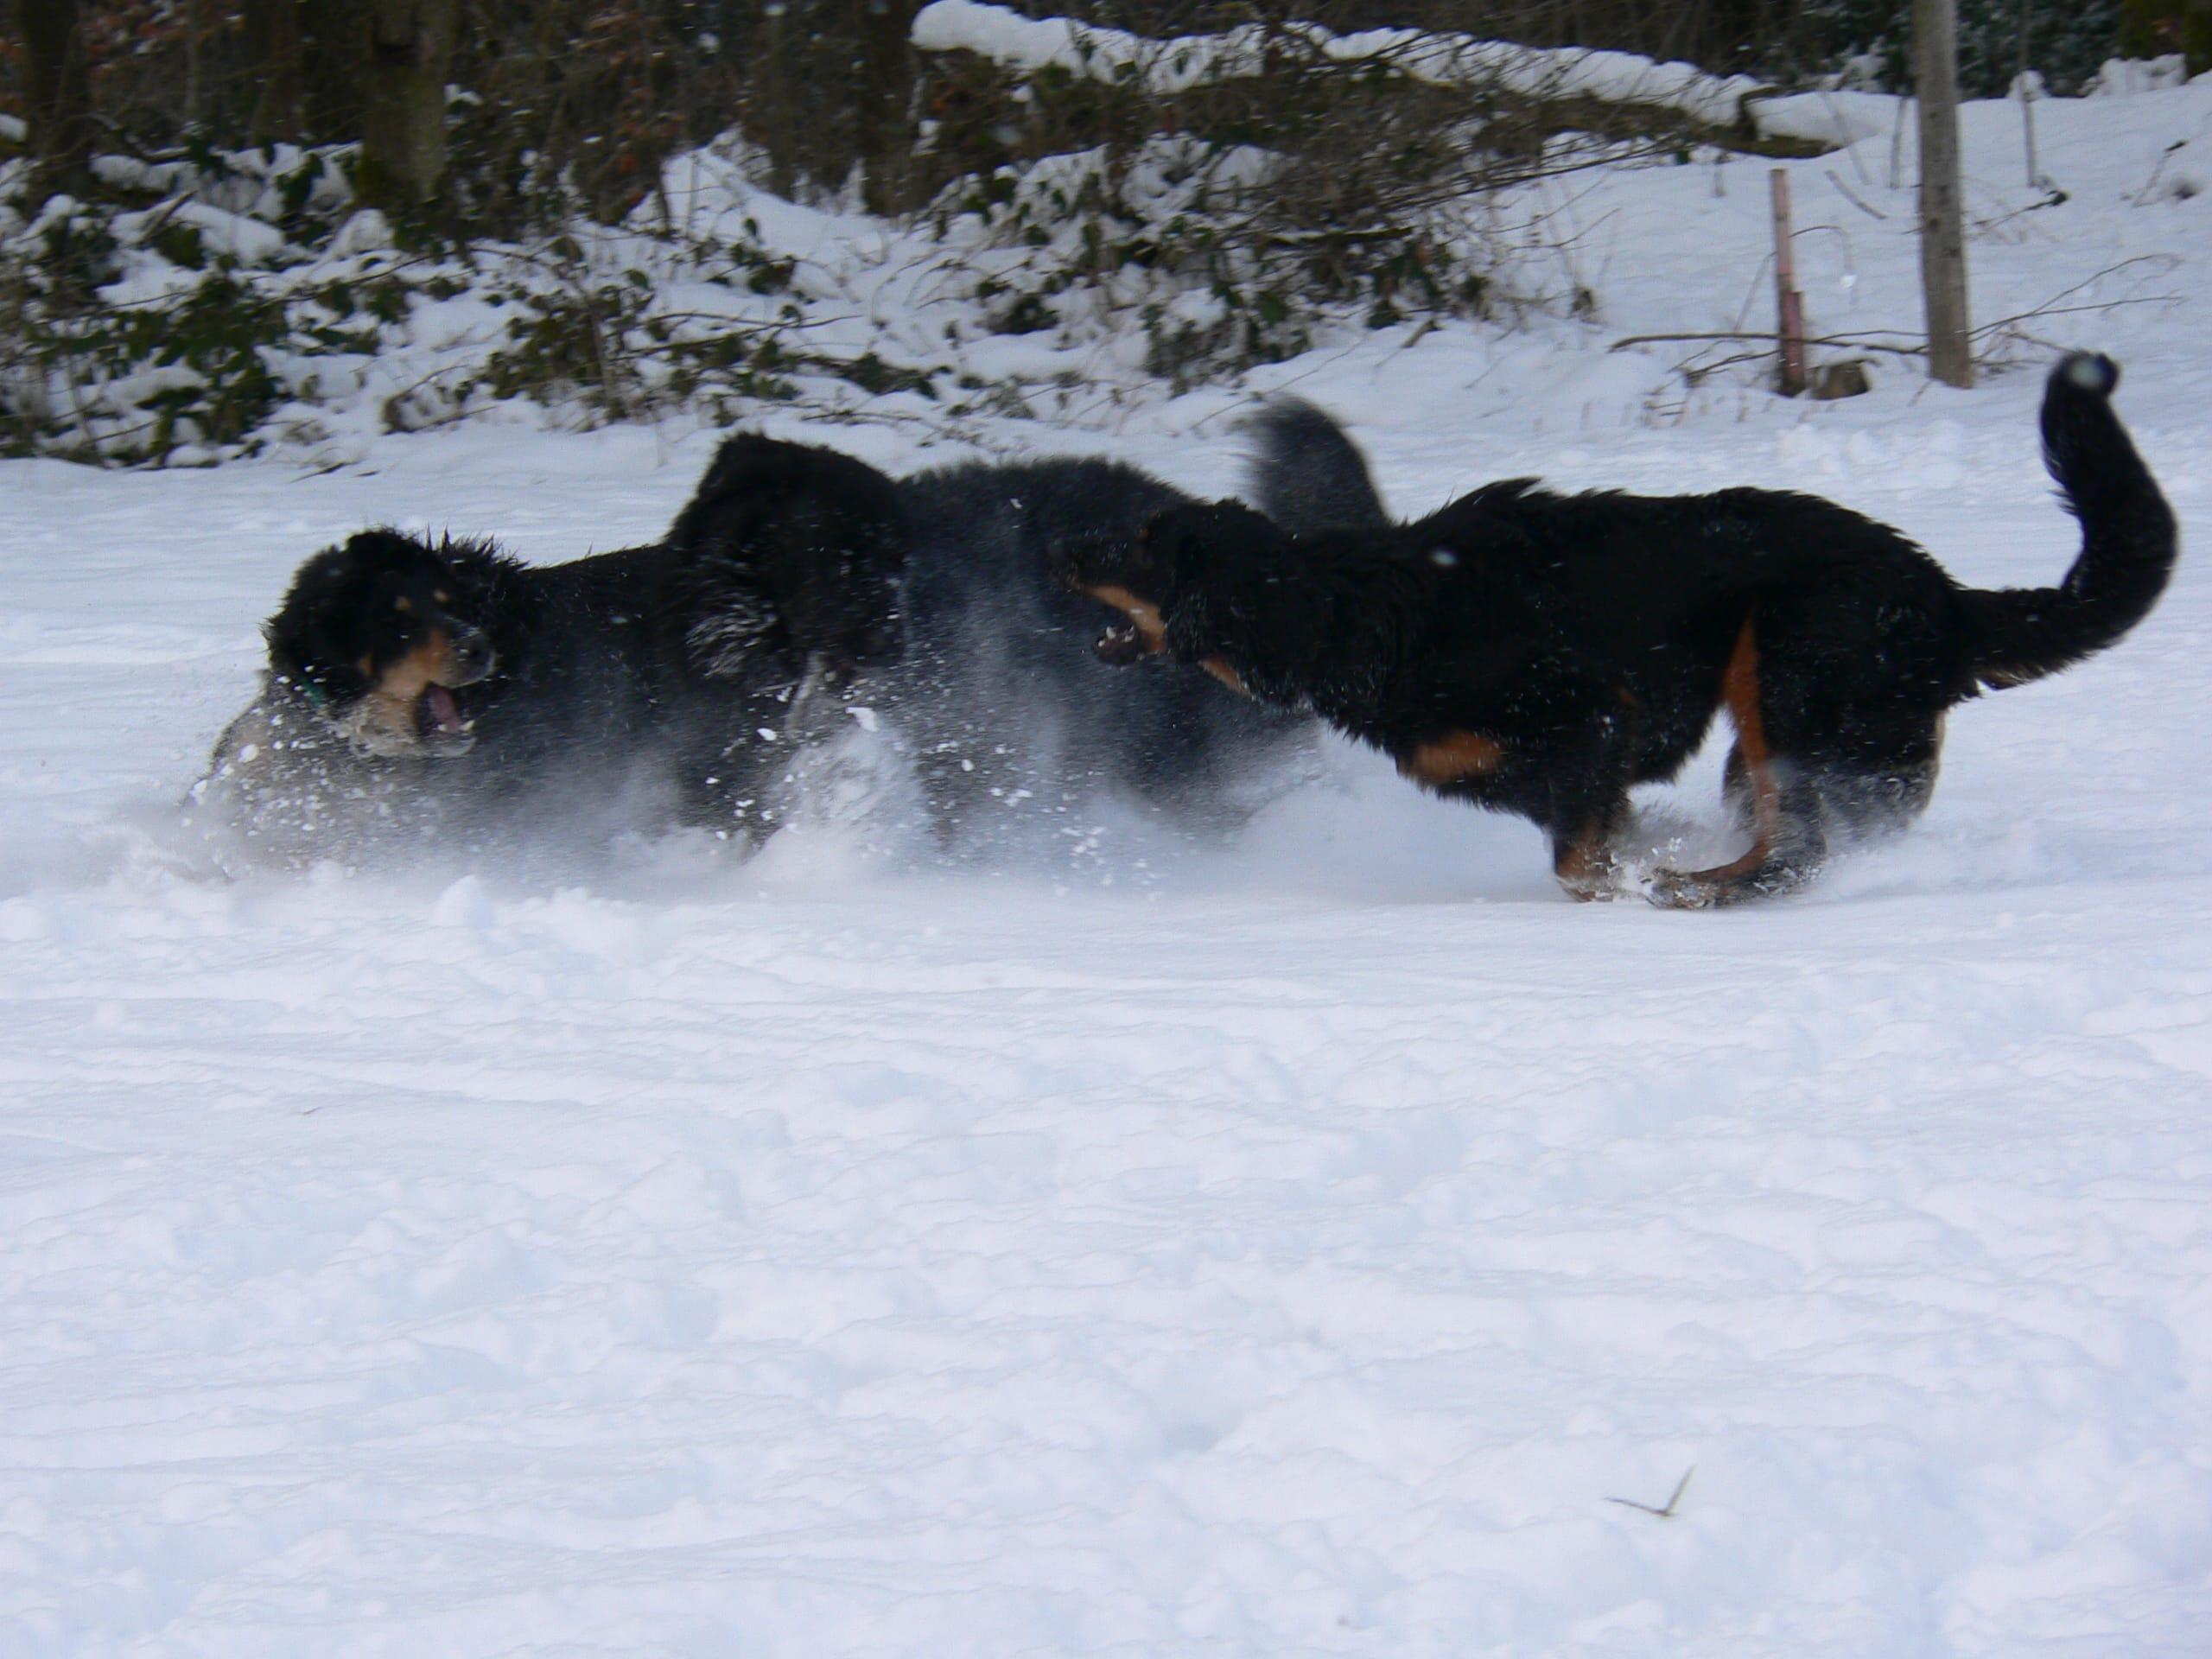 Gemeinsam_Amigo_Baika_Akasha_Winter_2005_1